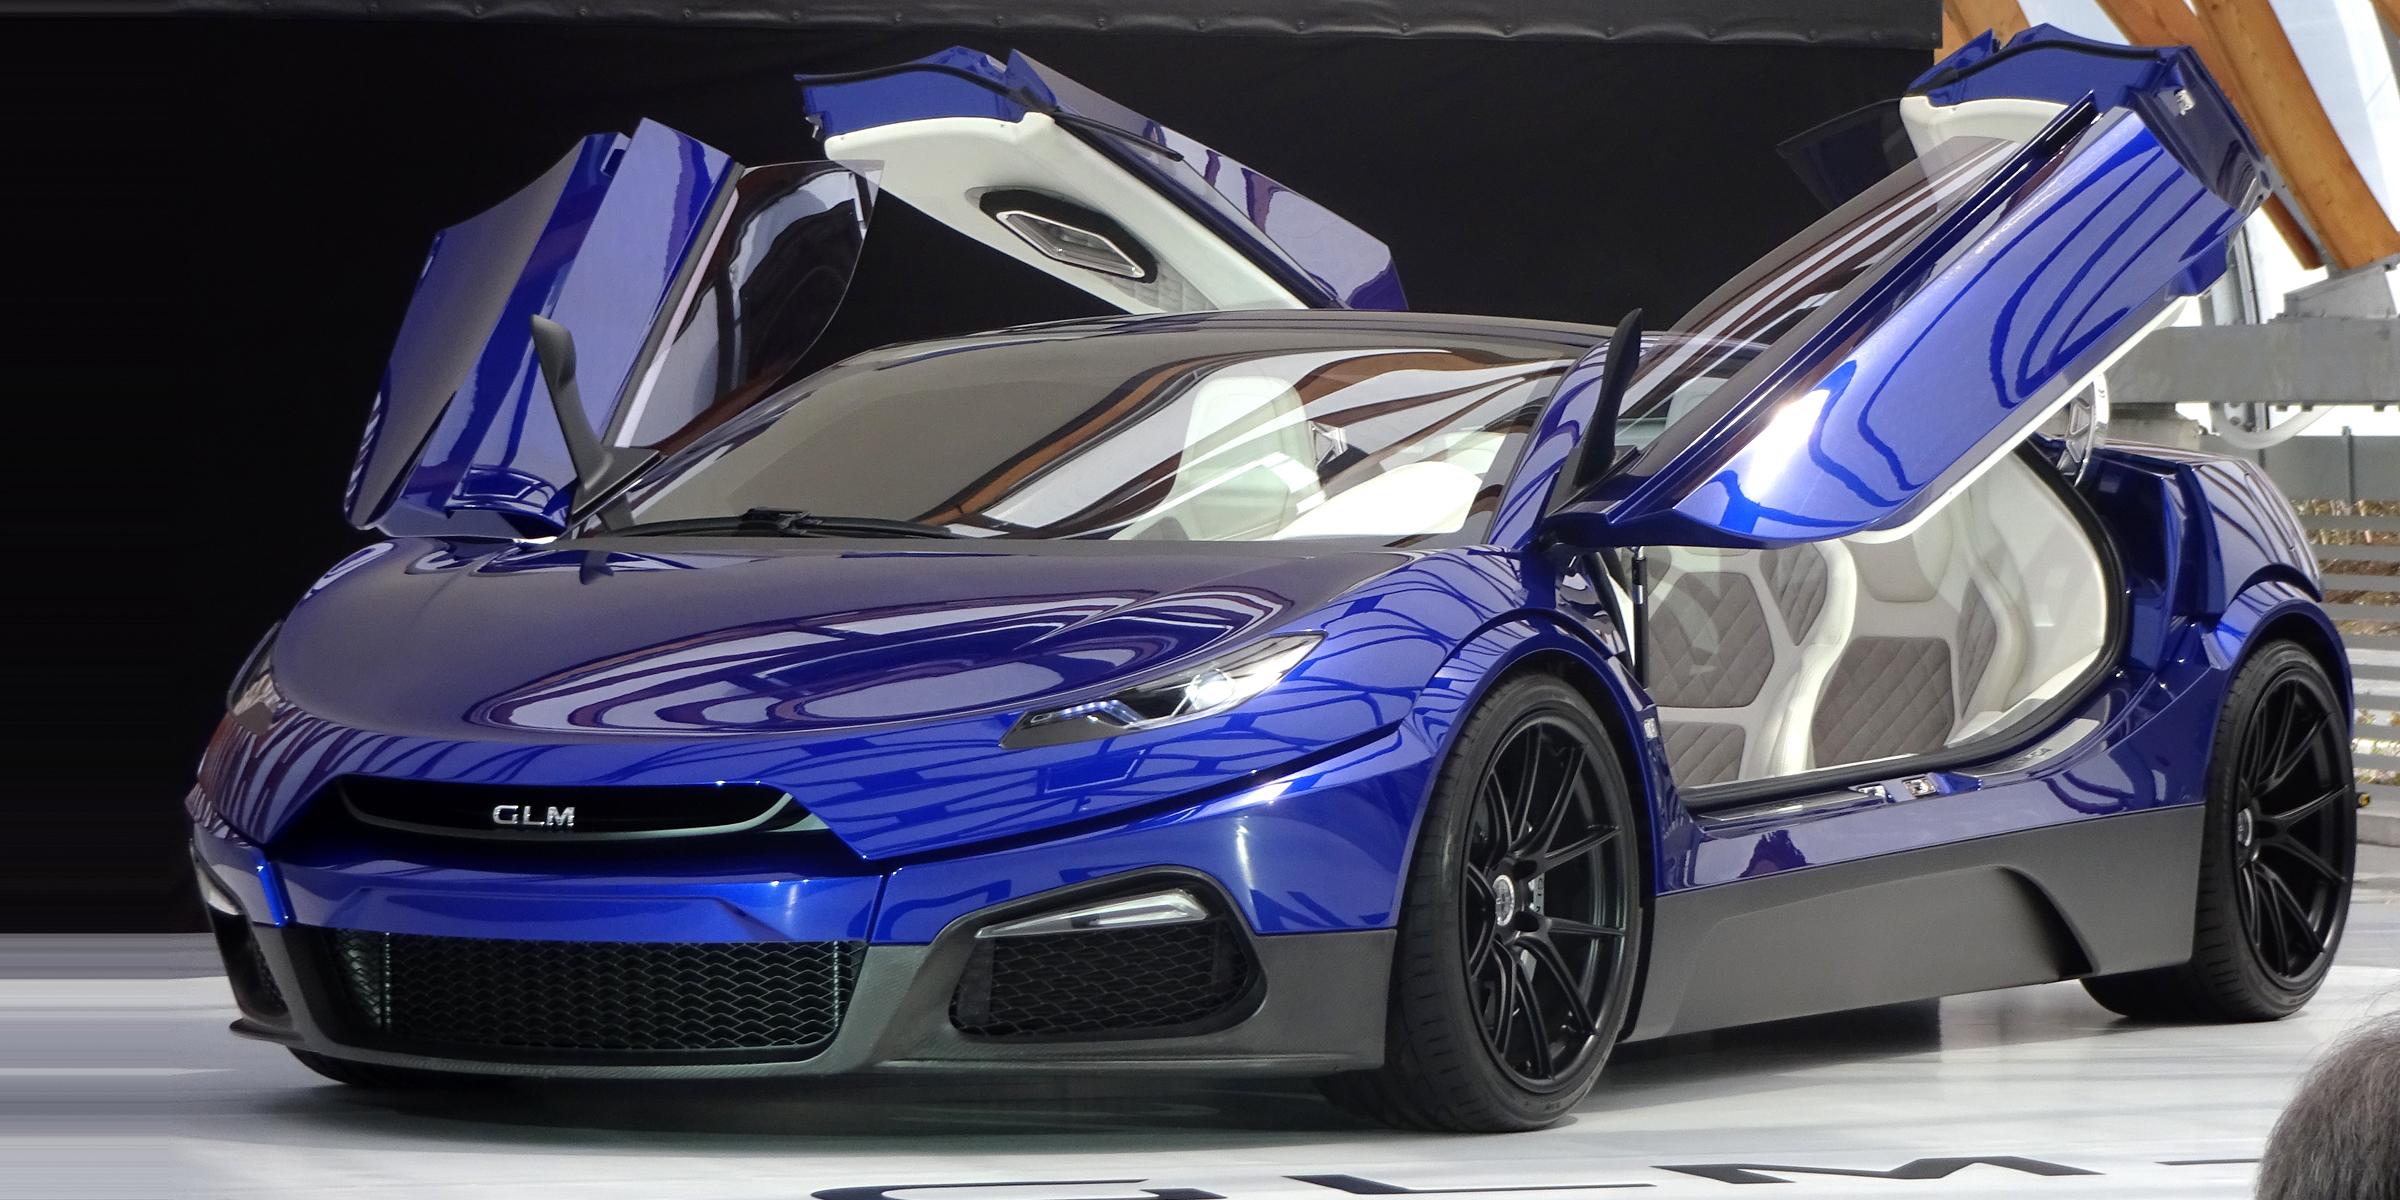 Glm To Launch 40 Million Yen Ev Supercar In 2019 Japan